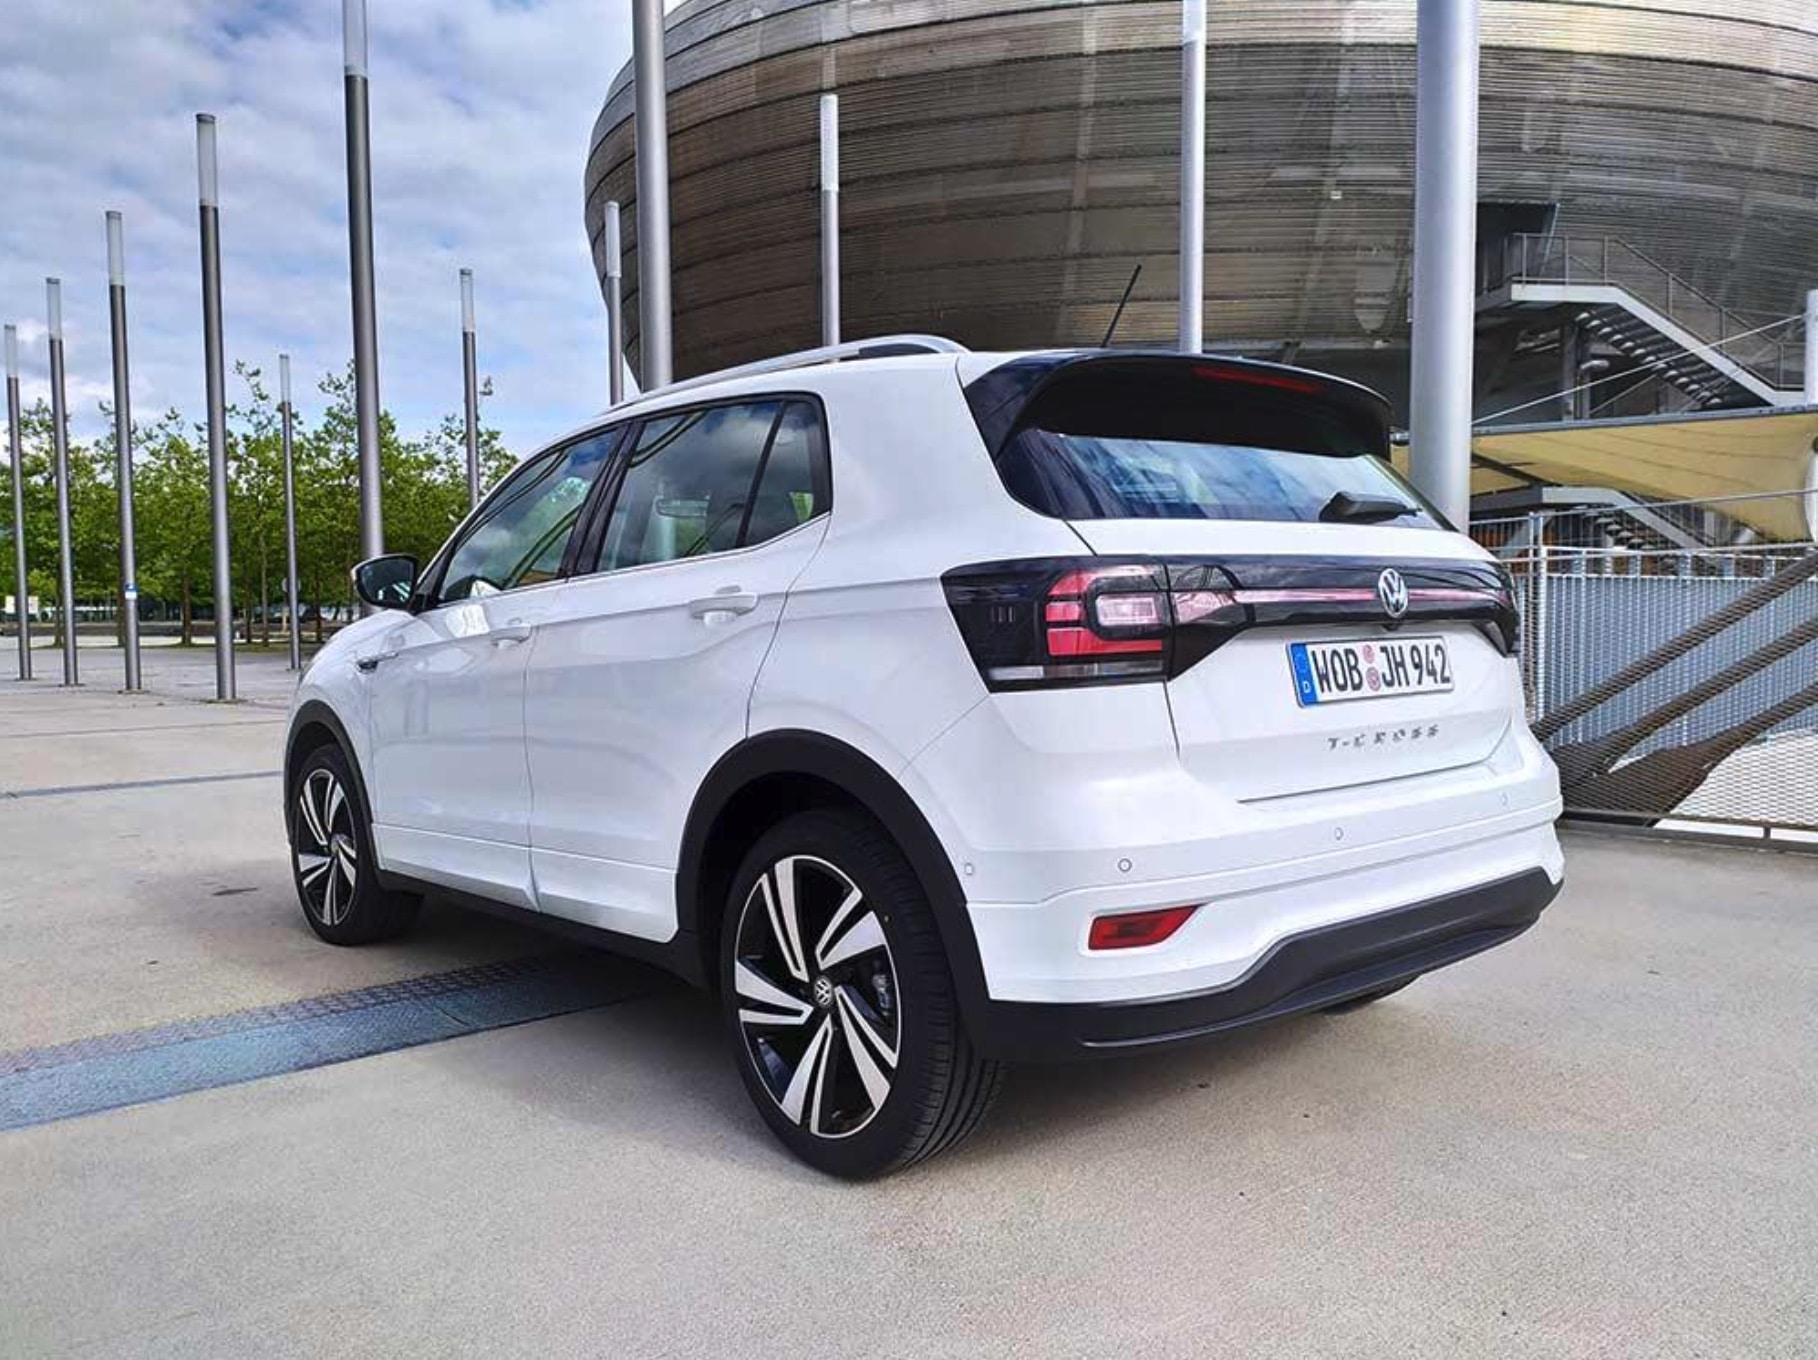 VW T Cross 1.0 Style Leasingmarkt Privatleasing hinten